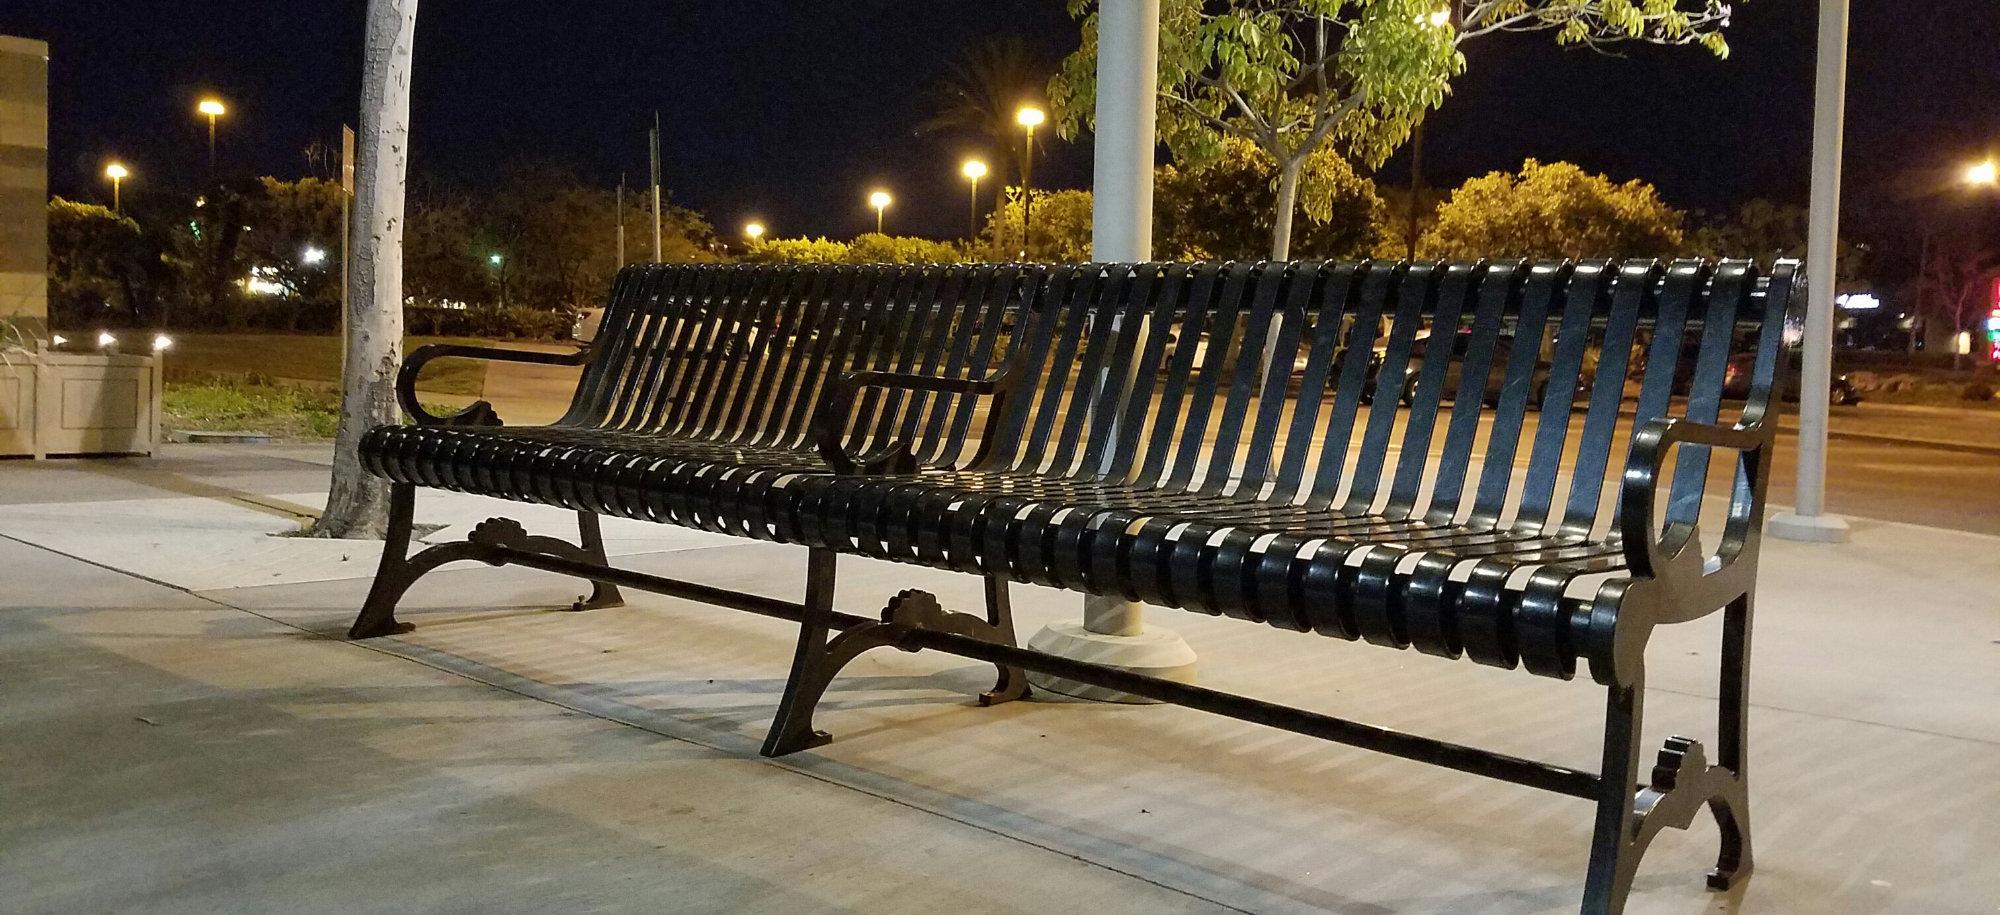 metal bench seating background